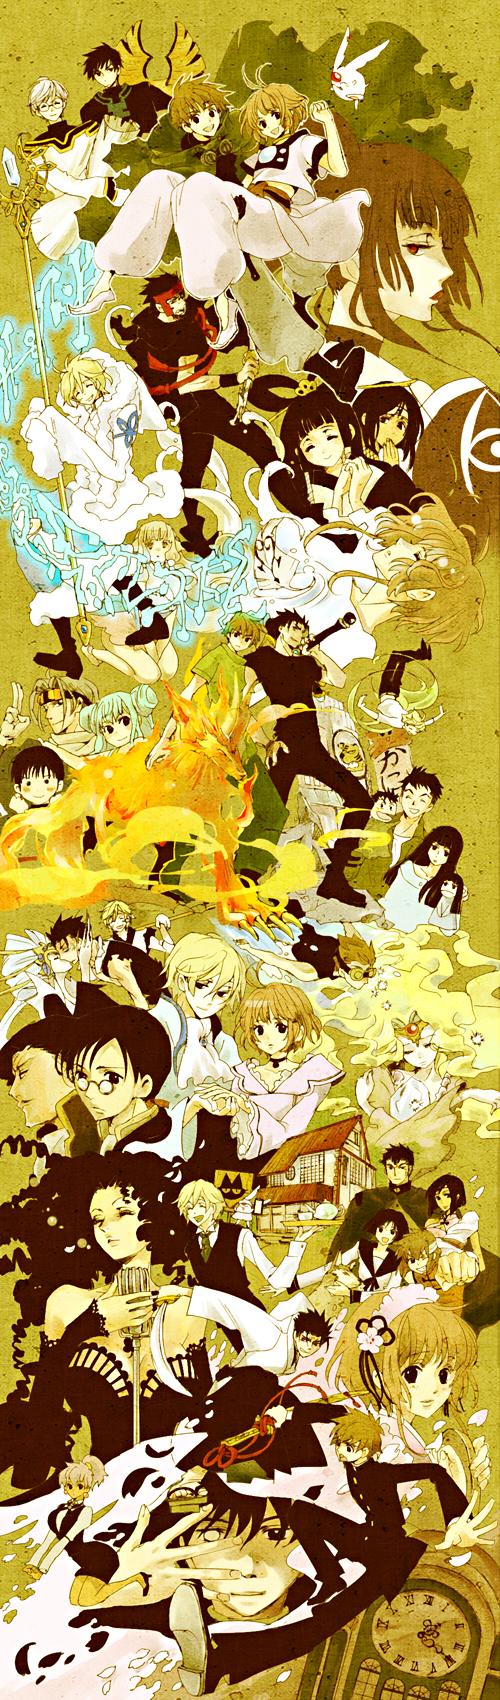 Tags: Anime, Fujimoto (Pixiv1086013), xxxHOLiC, Chobits, Tsubasa: RESERVoir CHRoNiCLE, Mokona Modoki, Princess Sakura, Souma (TRC), Daidouji Tomoyo (TRC), Fay D. Flourite, Sakurazuka Seishirou (TRC), Chii, Li Syaoran (TRC)